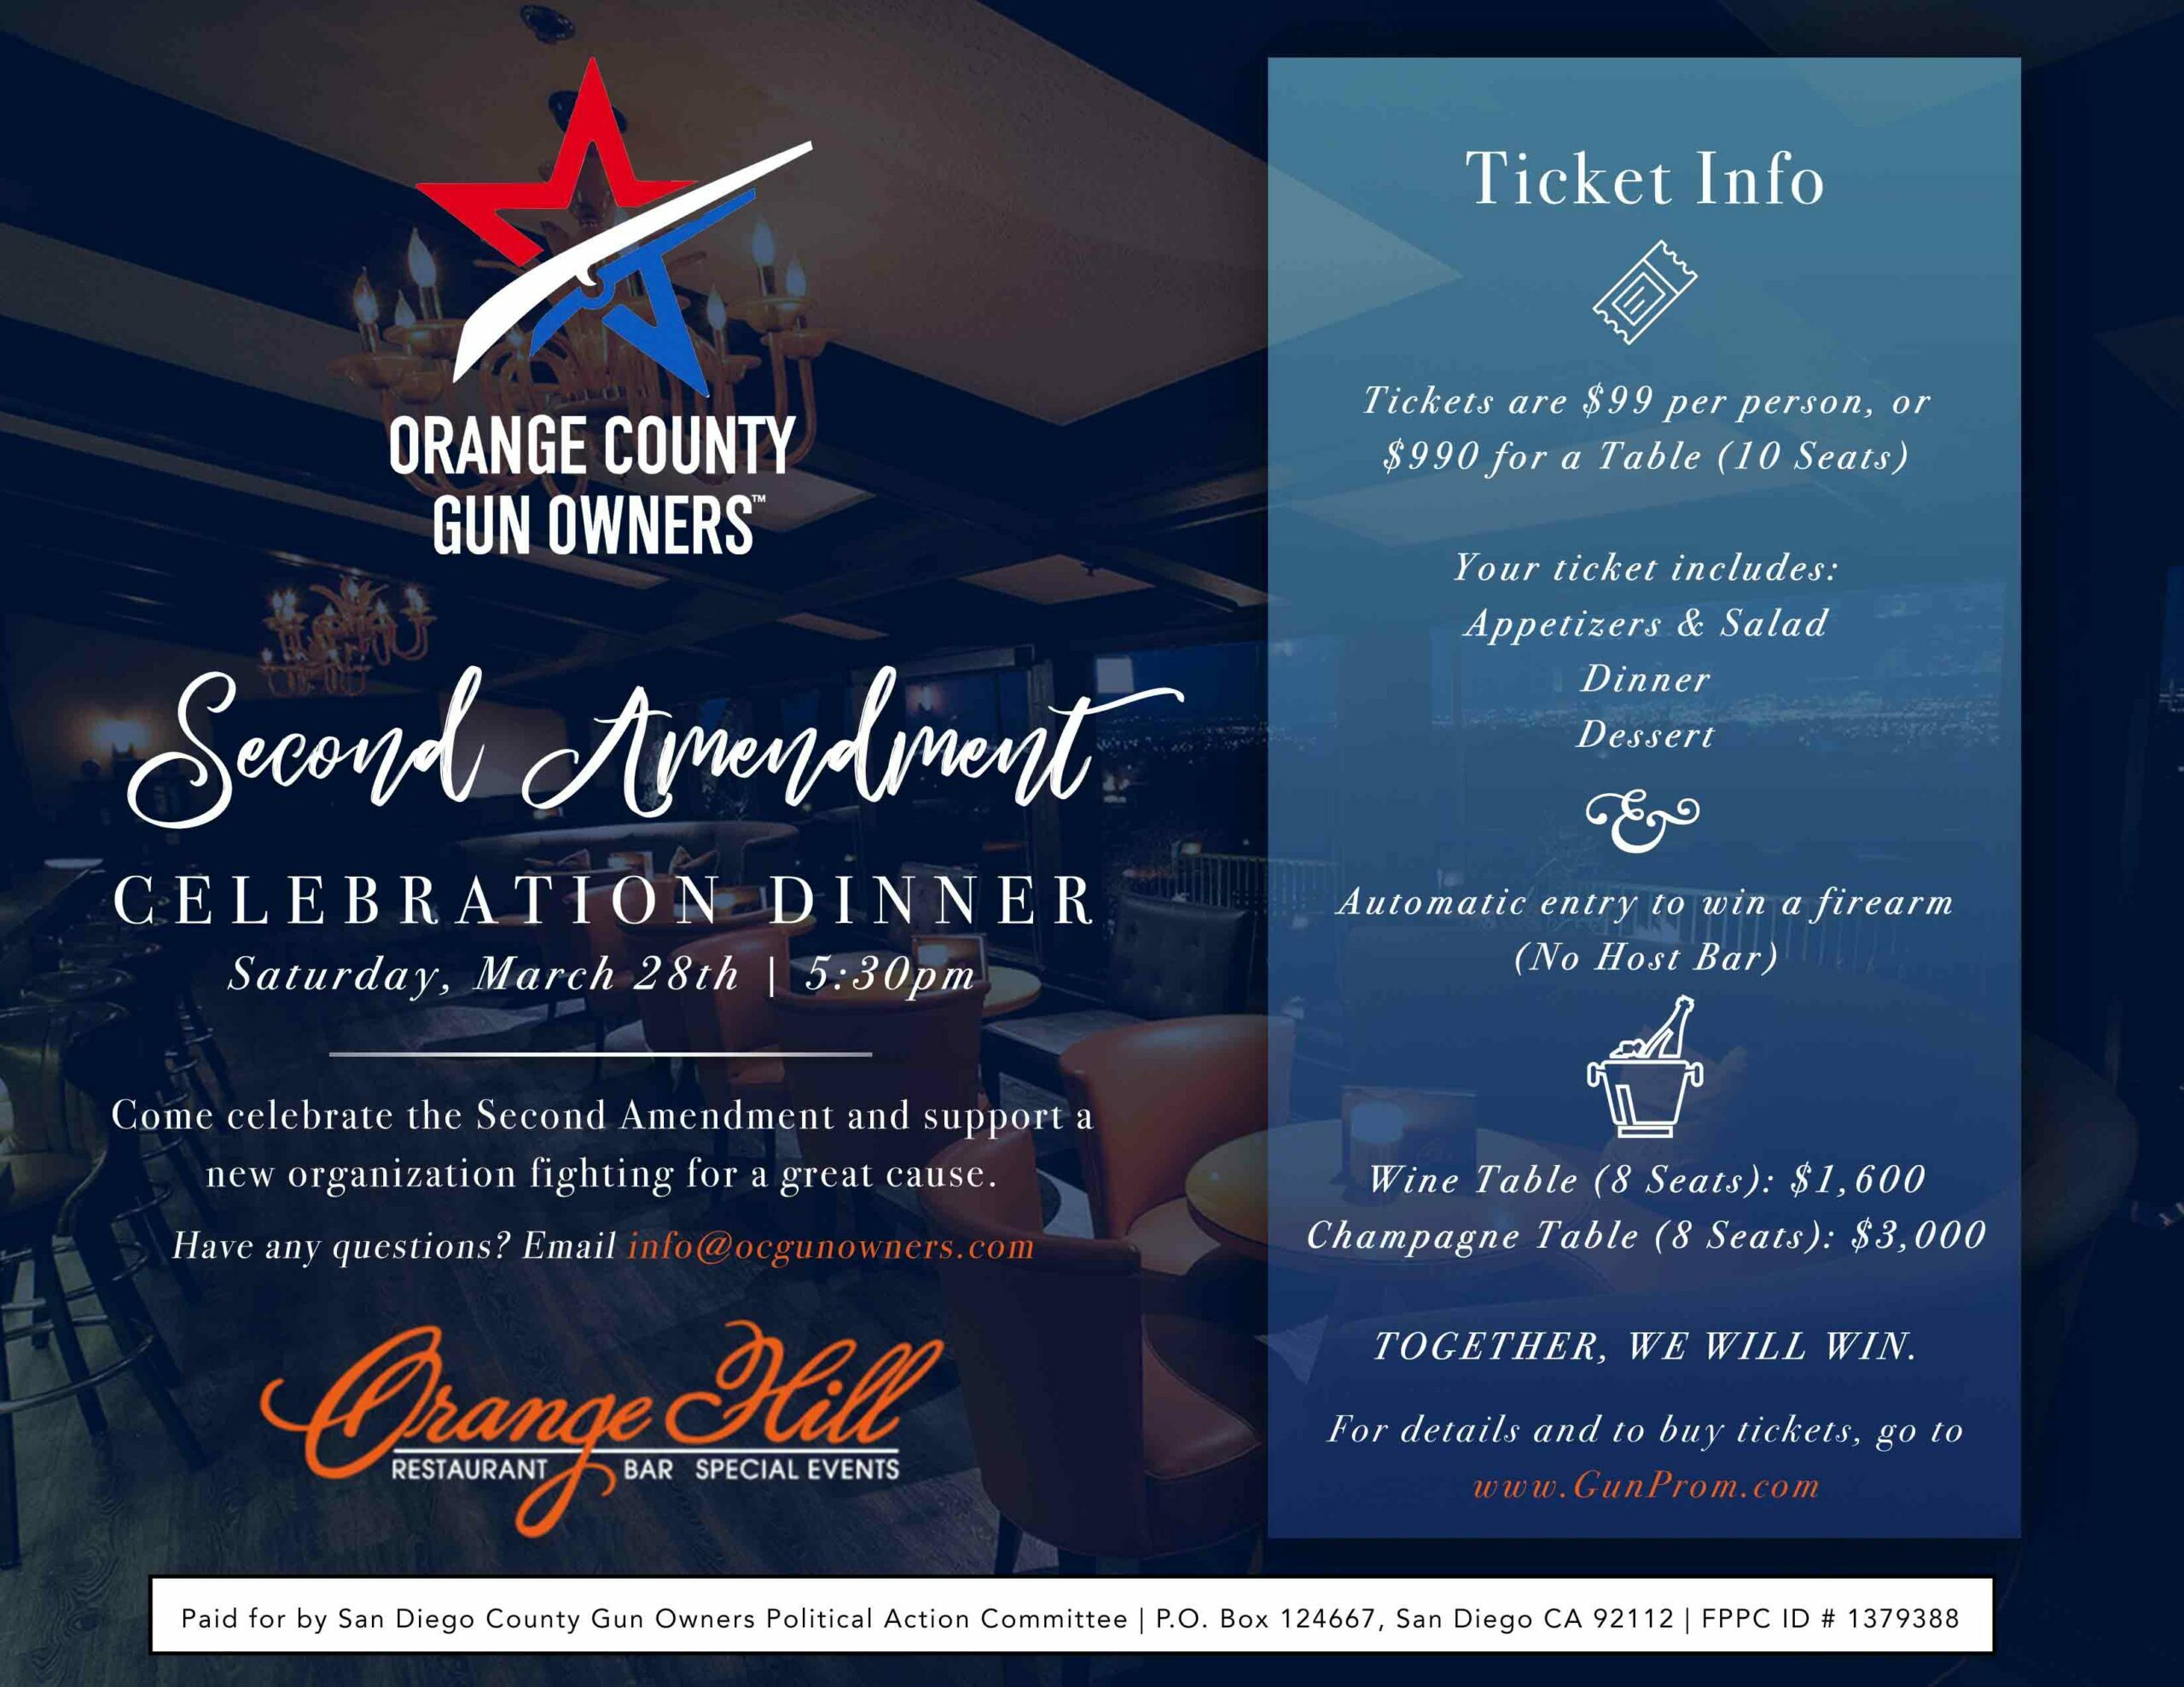 Orange County Gun Owners Dinner